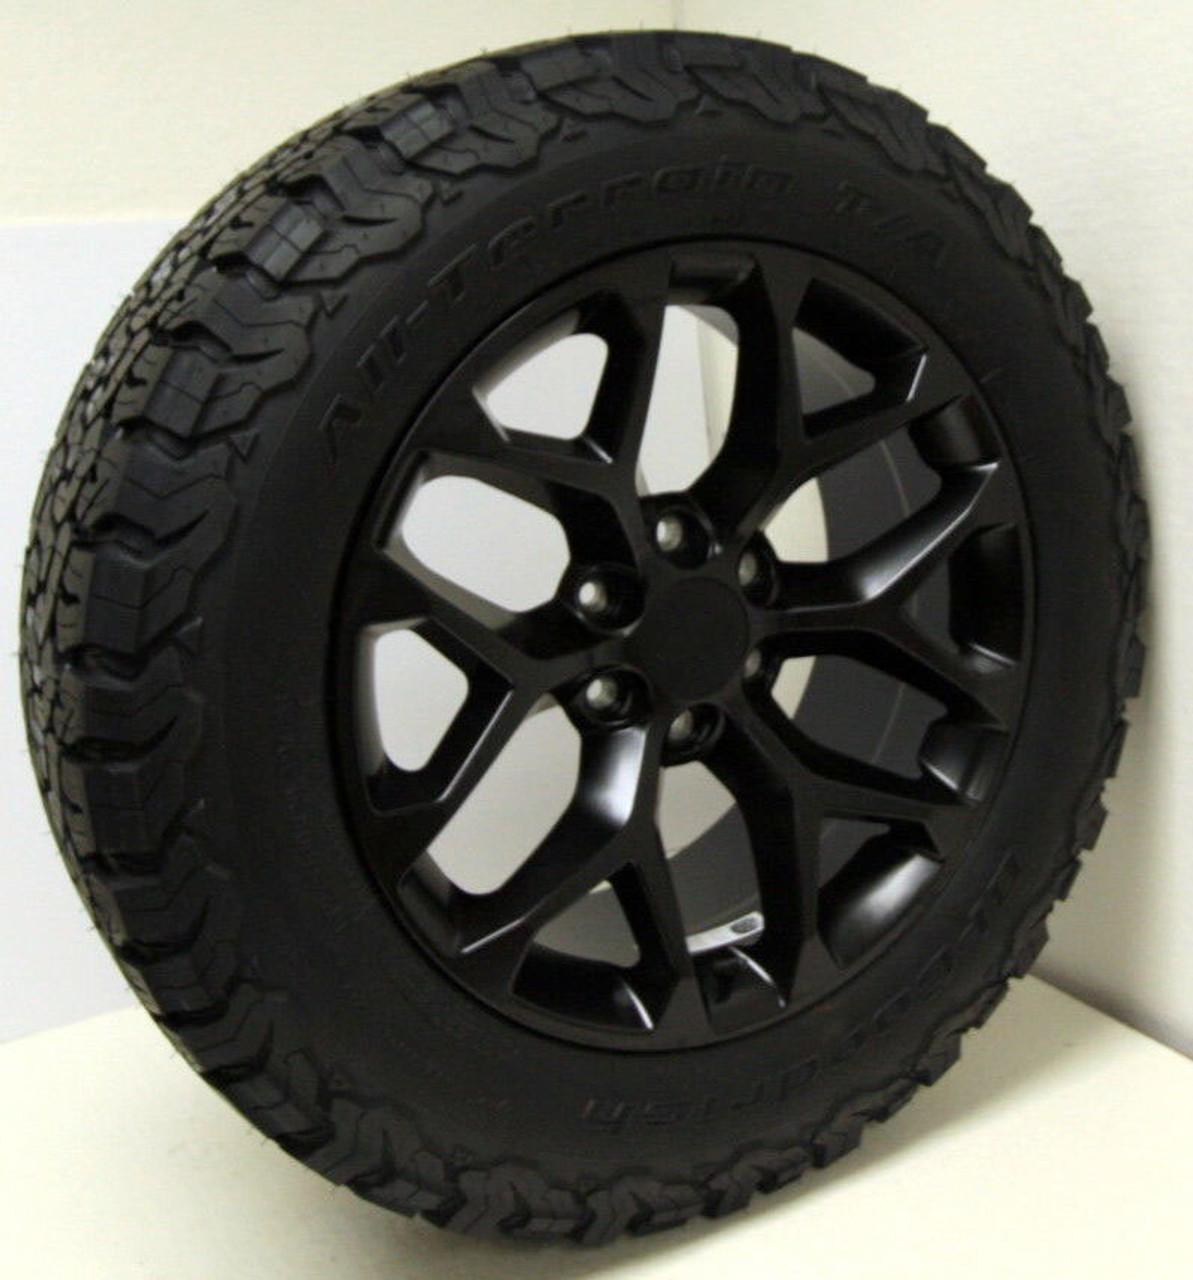 "Satin Matte Black 20"" Snowflake Wheels with BFG KO2 A/T Tires for Chevy Silverado, Tahoe, Suburban - New Set of 4"